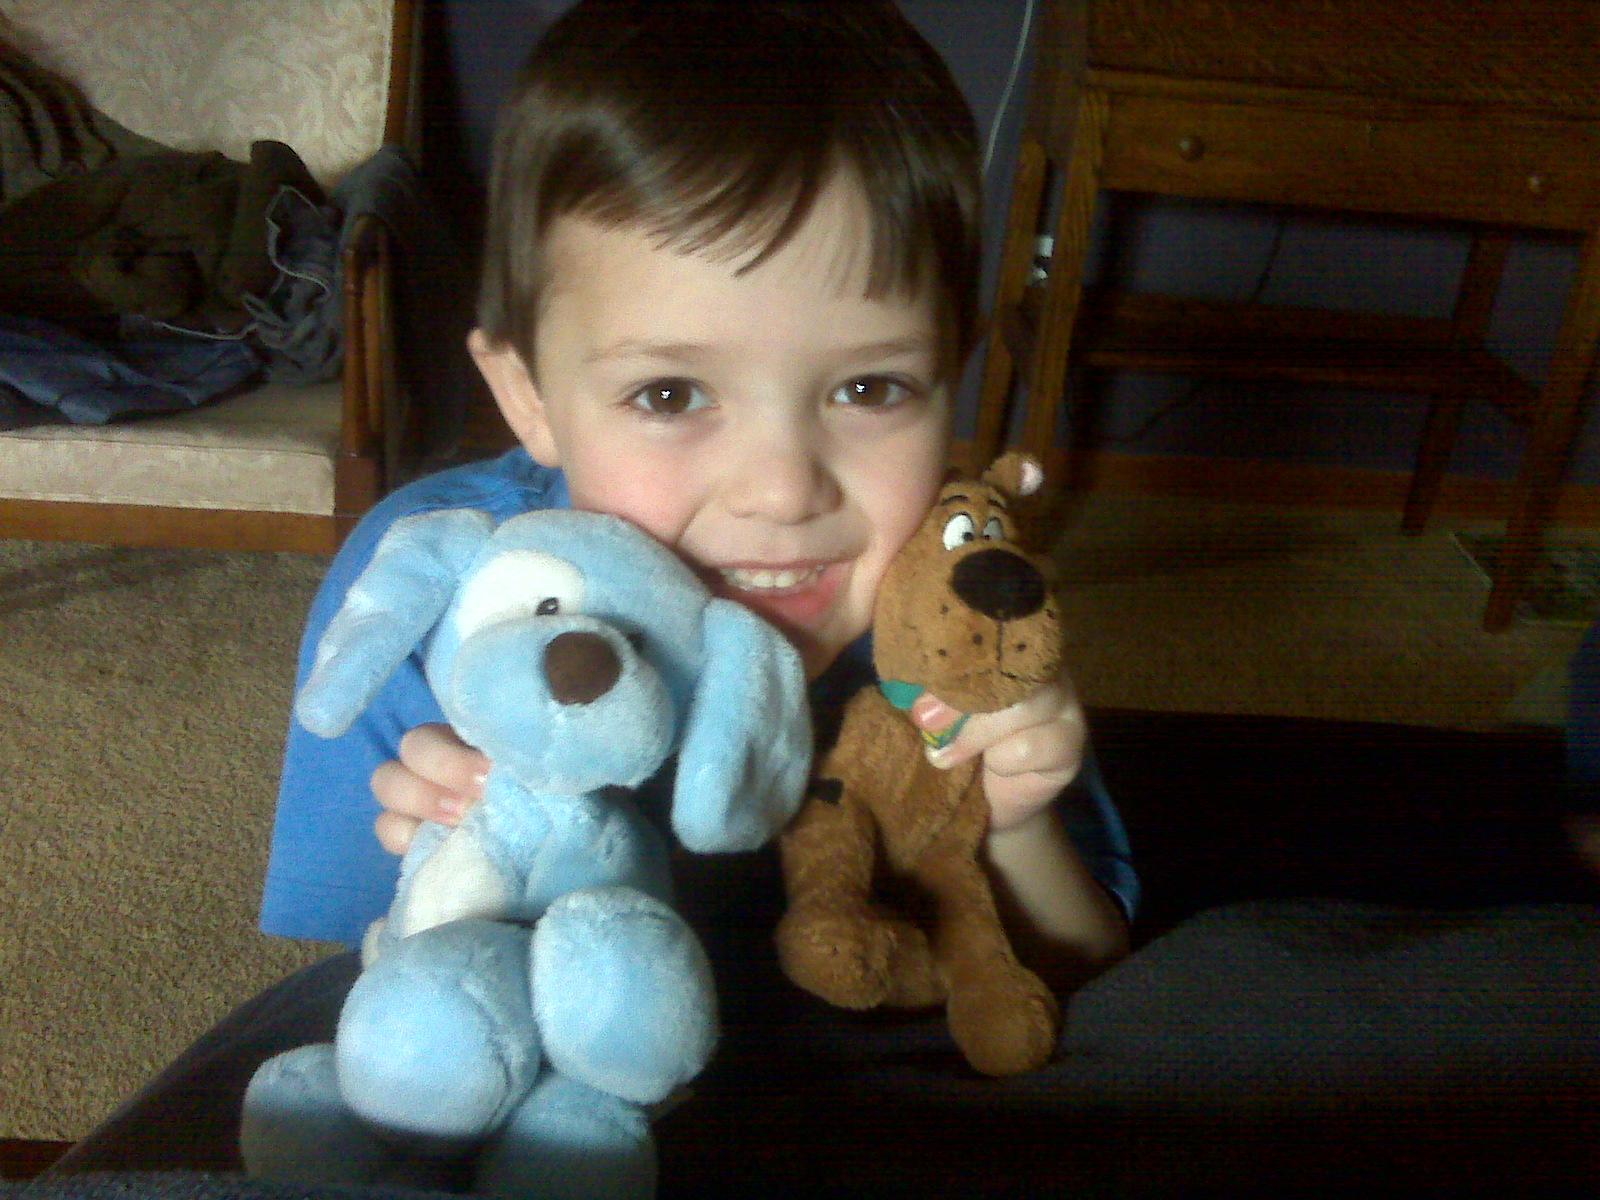 [graham+with+stuffed+animals.aspx]